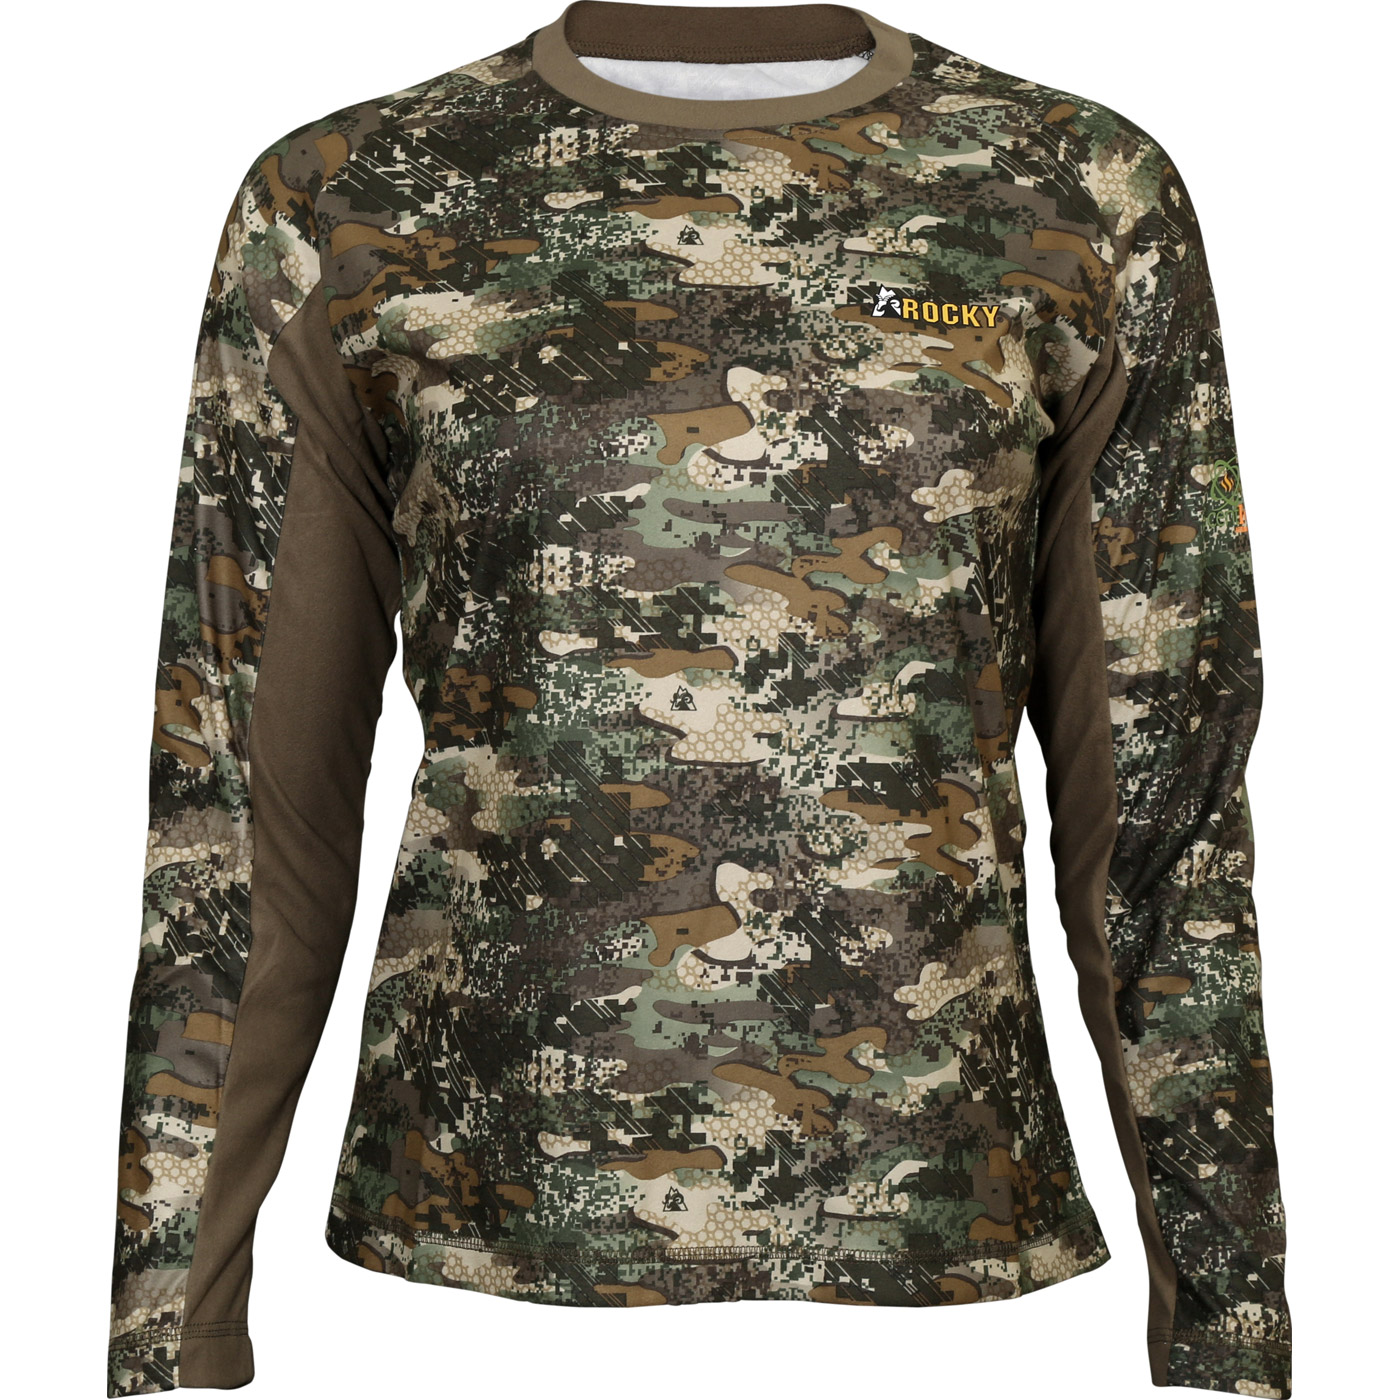 b0ed9509d1ecb Rocky SilentHunter Women's Long-Sleeve Shirt, Rocky Venator Camo, large